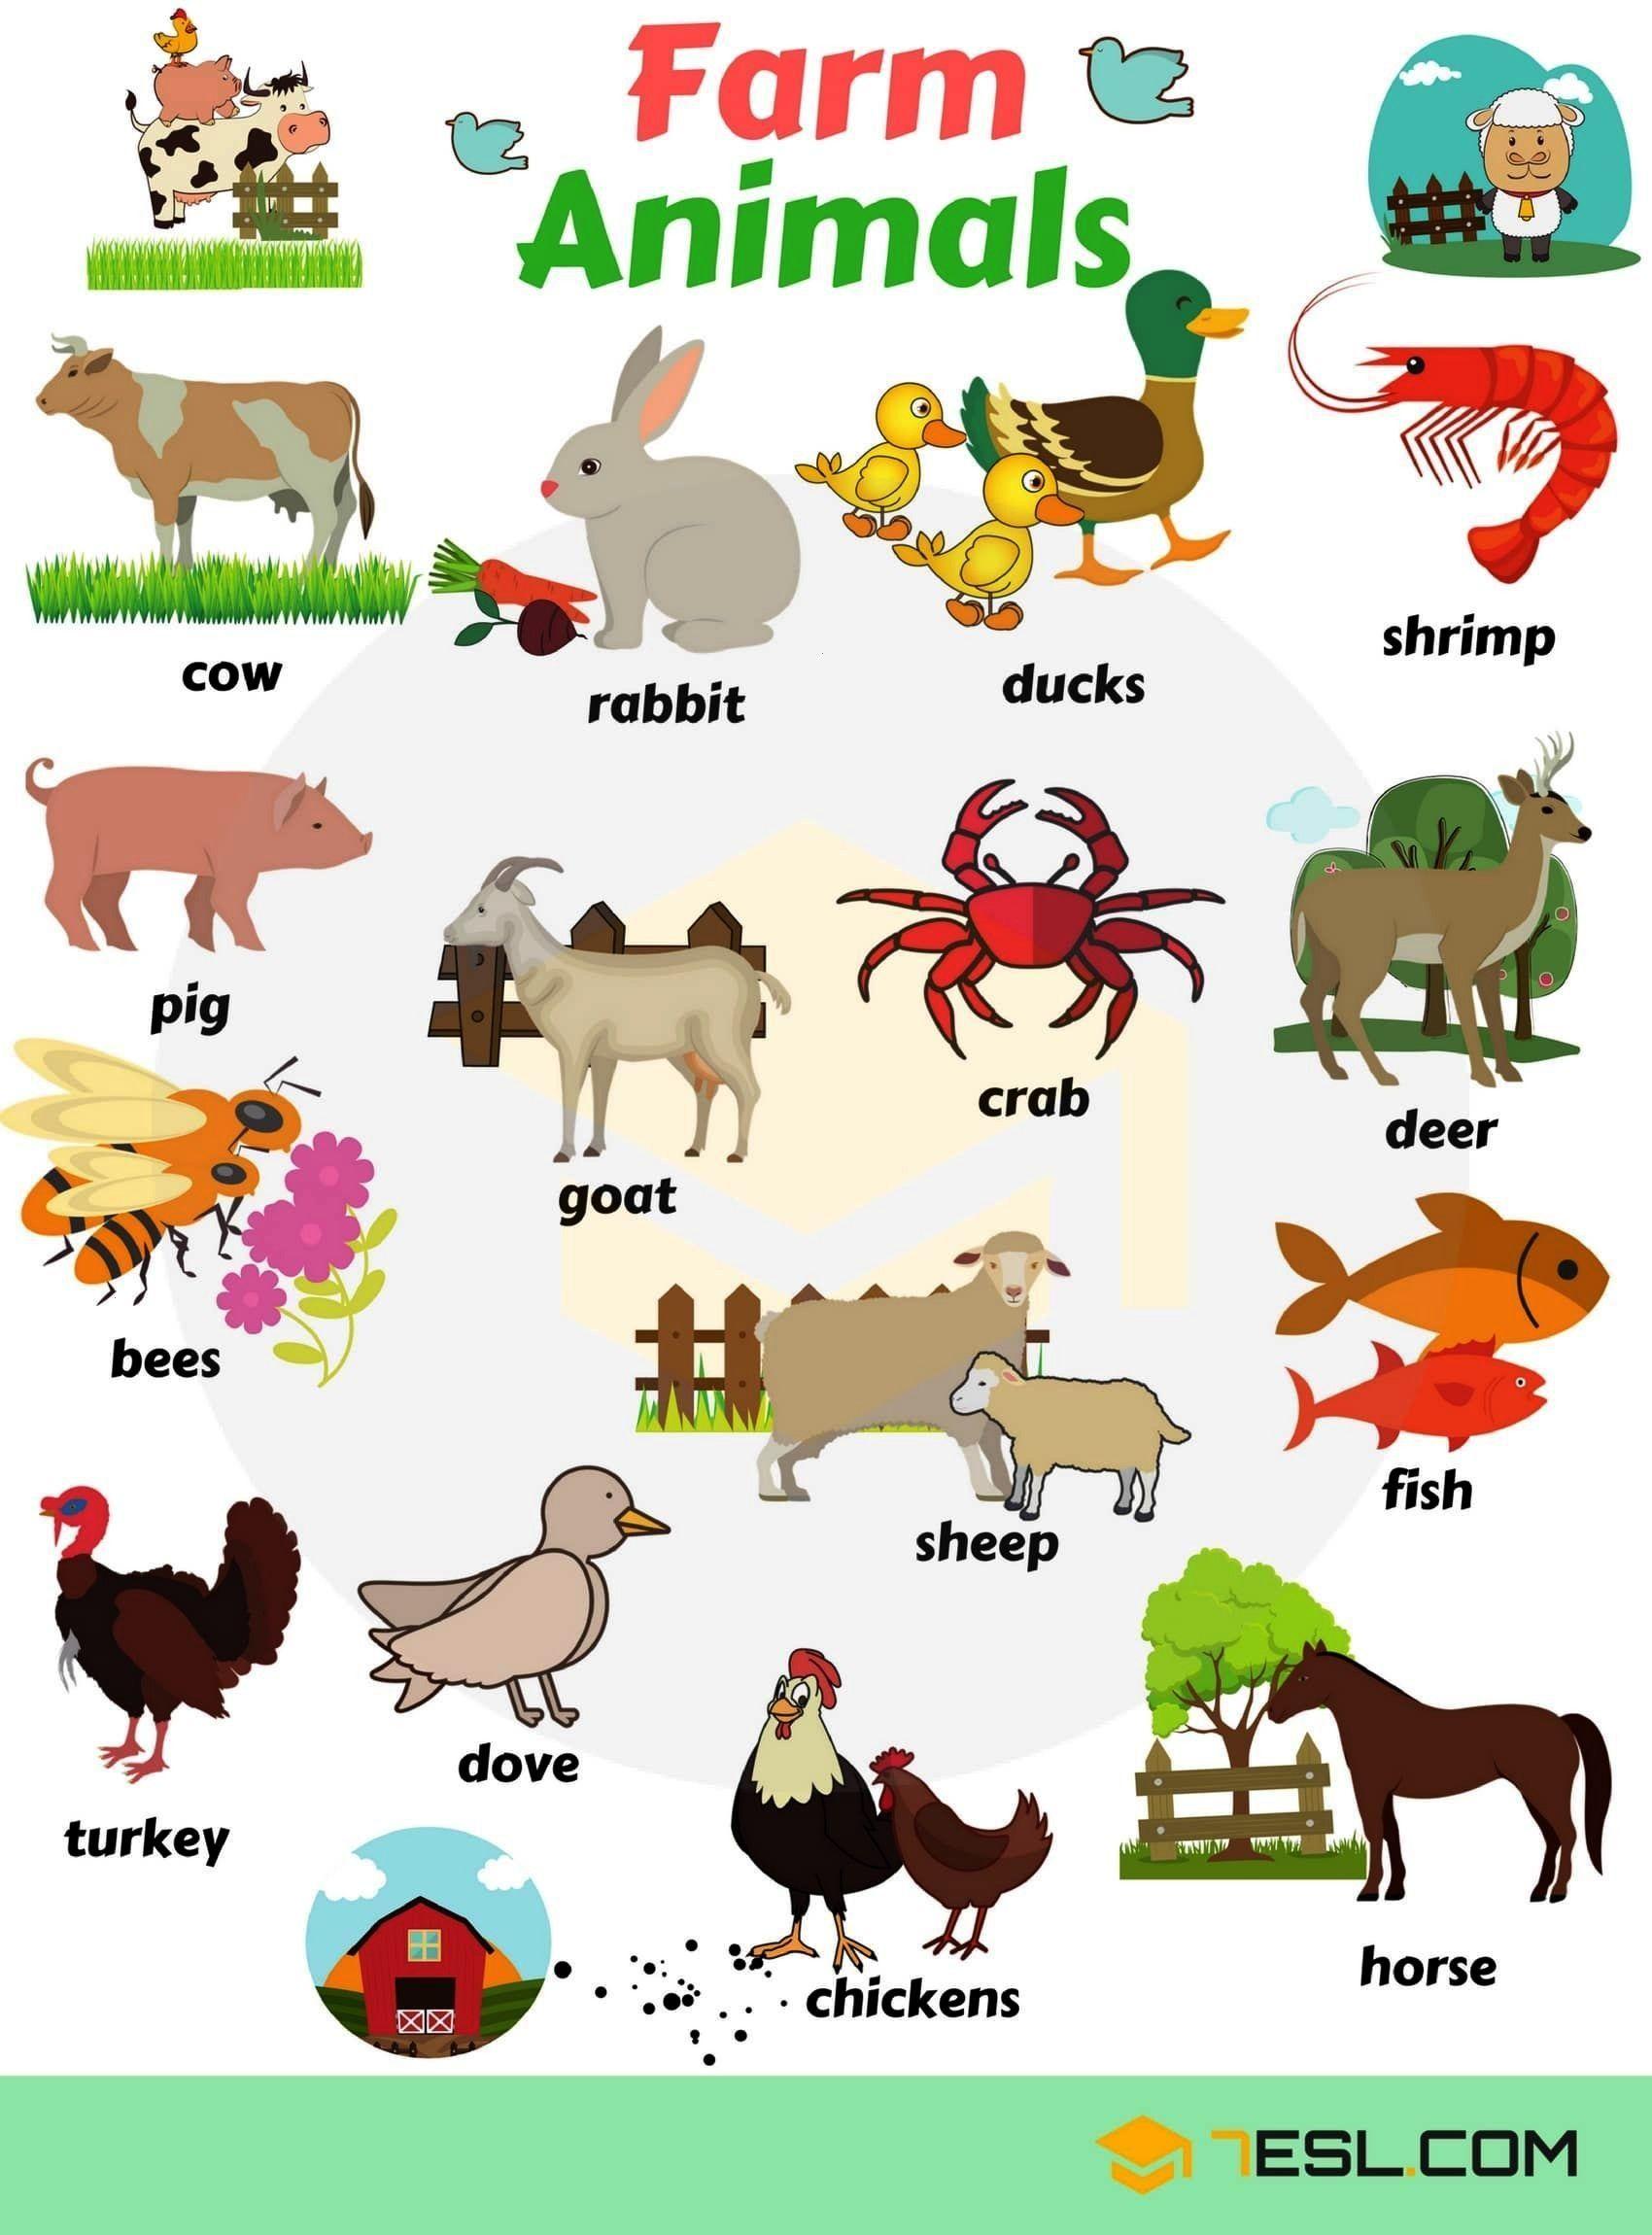 Animals Farm Listfarm Animals List Farm Animals List Farm Animals List 3 6ks In 2020 Animals Name With Picture Farm Animals List Animals Name In English